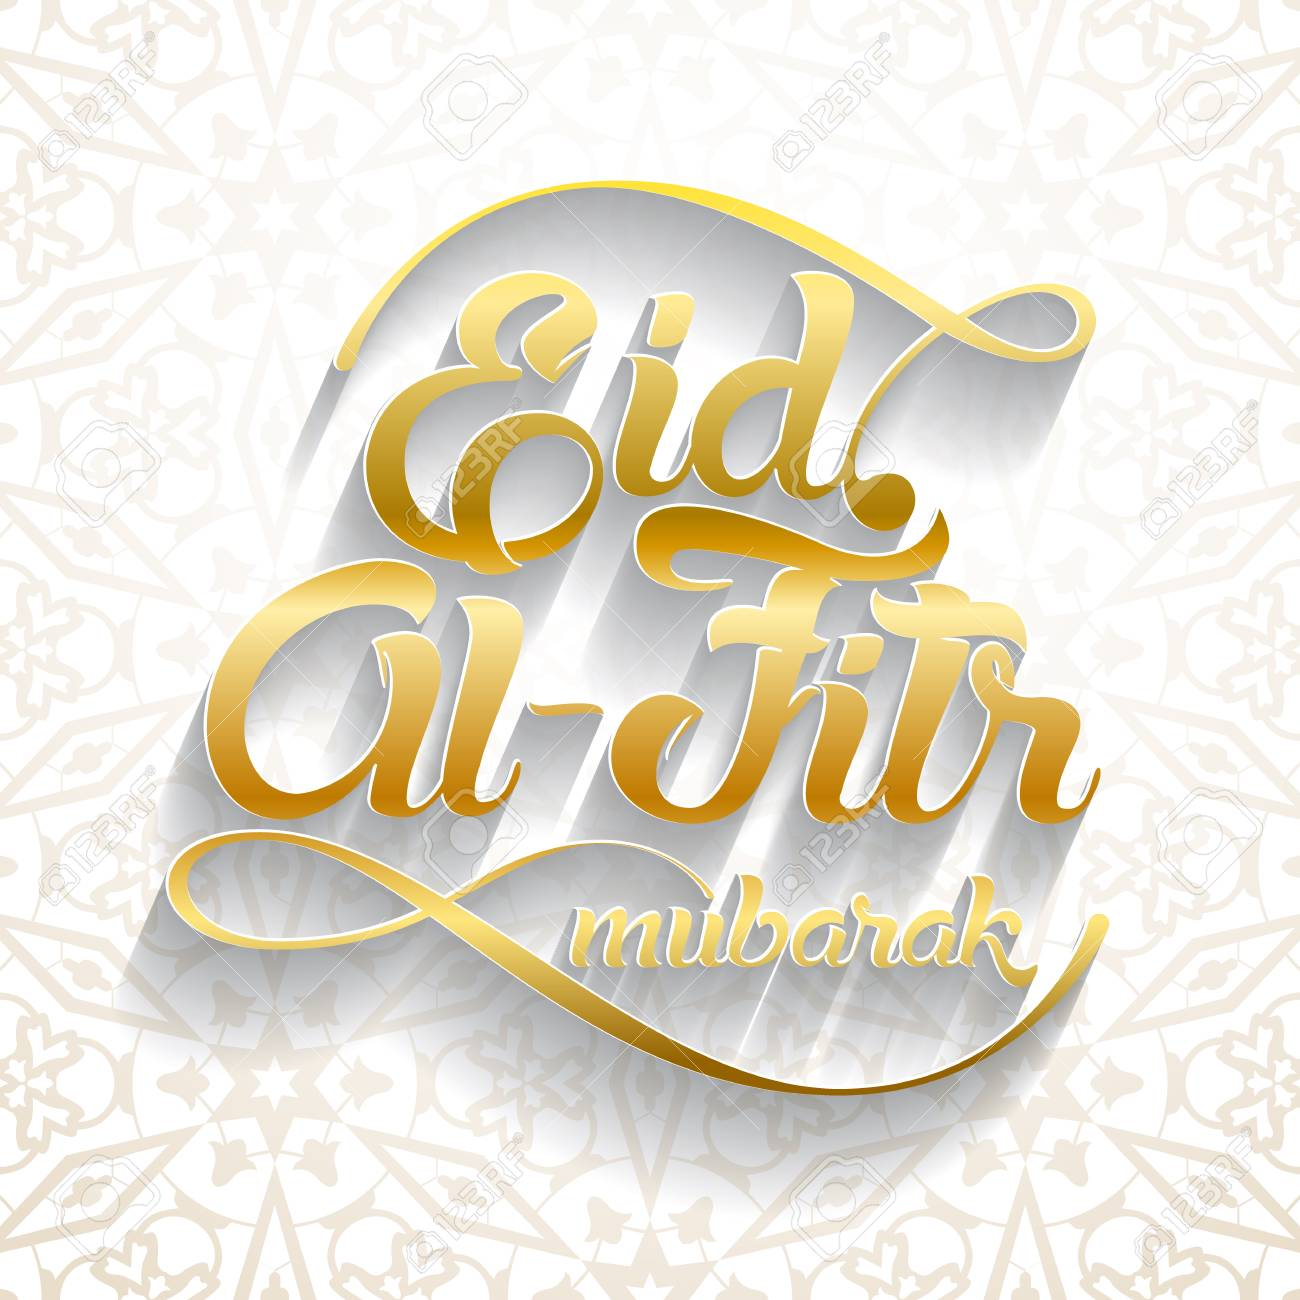 Eid al fitr mubarak greeting card vector illustration welcoming eid al fitr mubarak greeting card vector illustration welcoming ramadan stock vector m4hsunfo